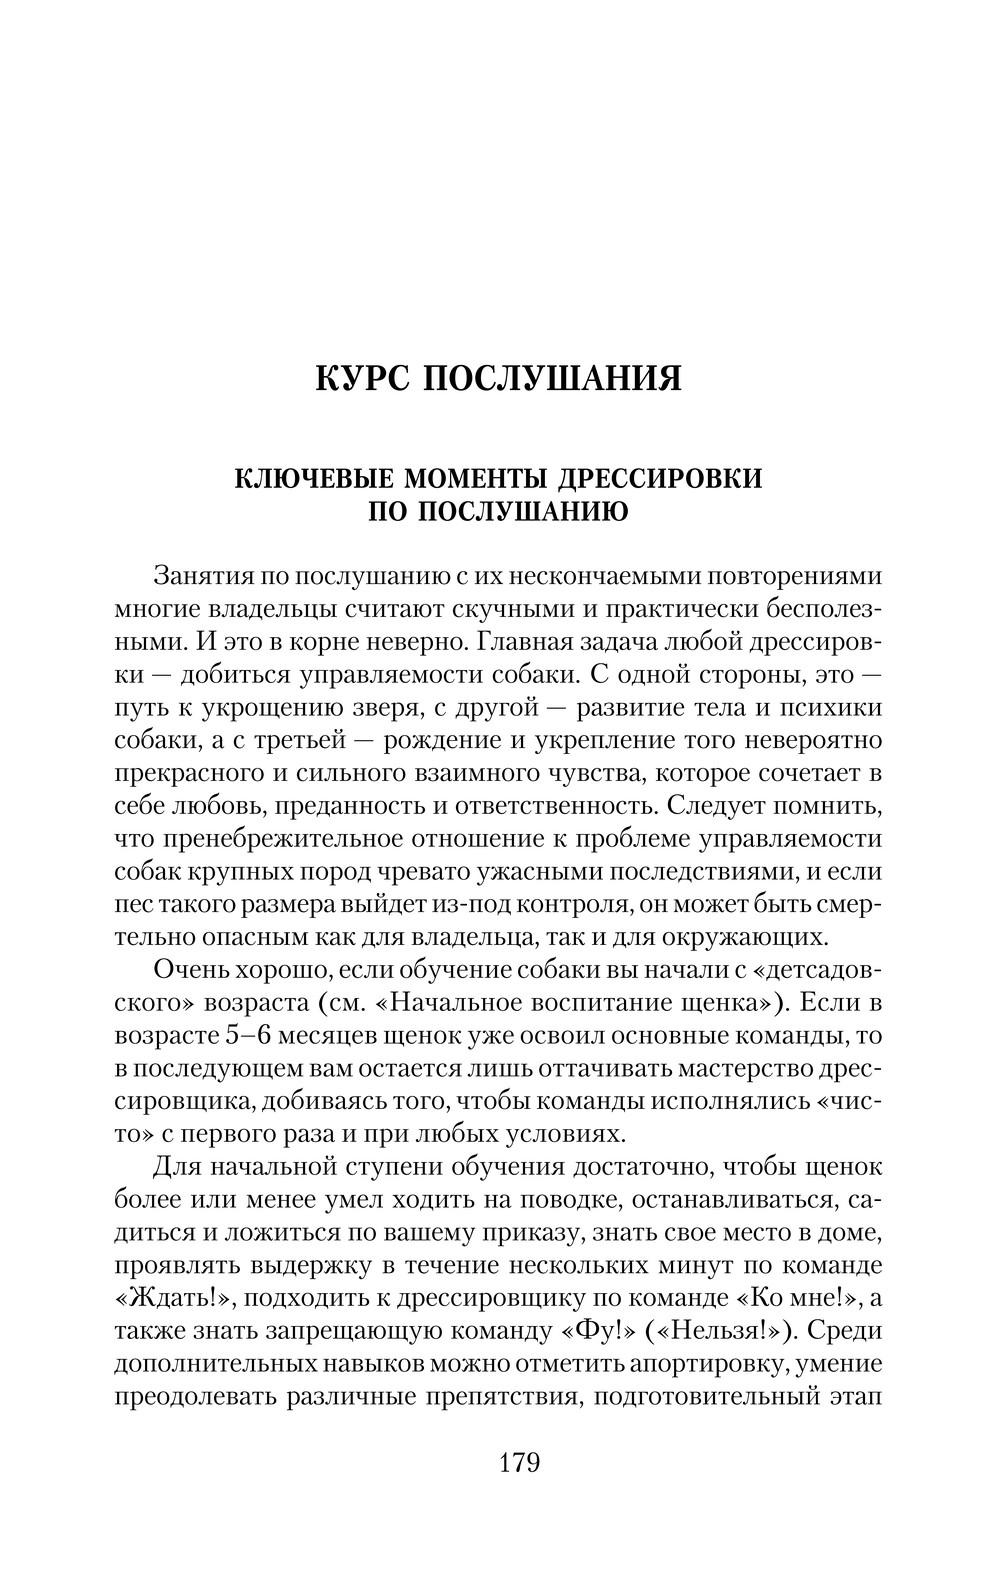 http://i6.imageban.ru/out/2014/01/12/395165a0fcb110bb5f26f5f584f2b0ee.jpg